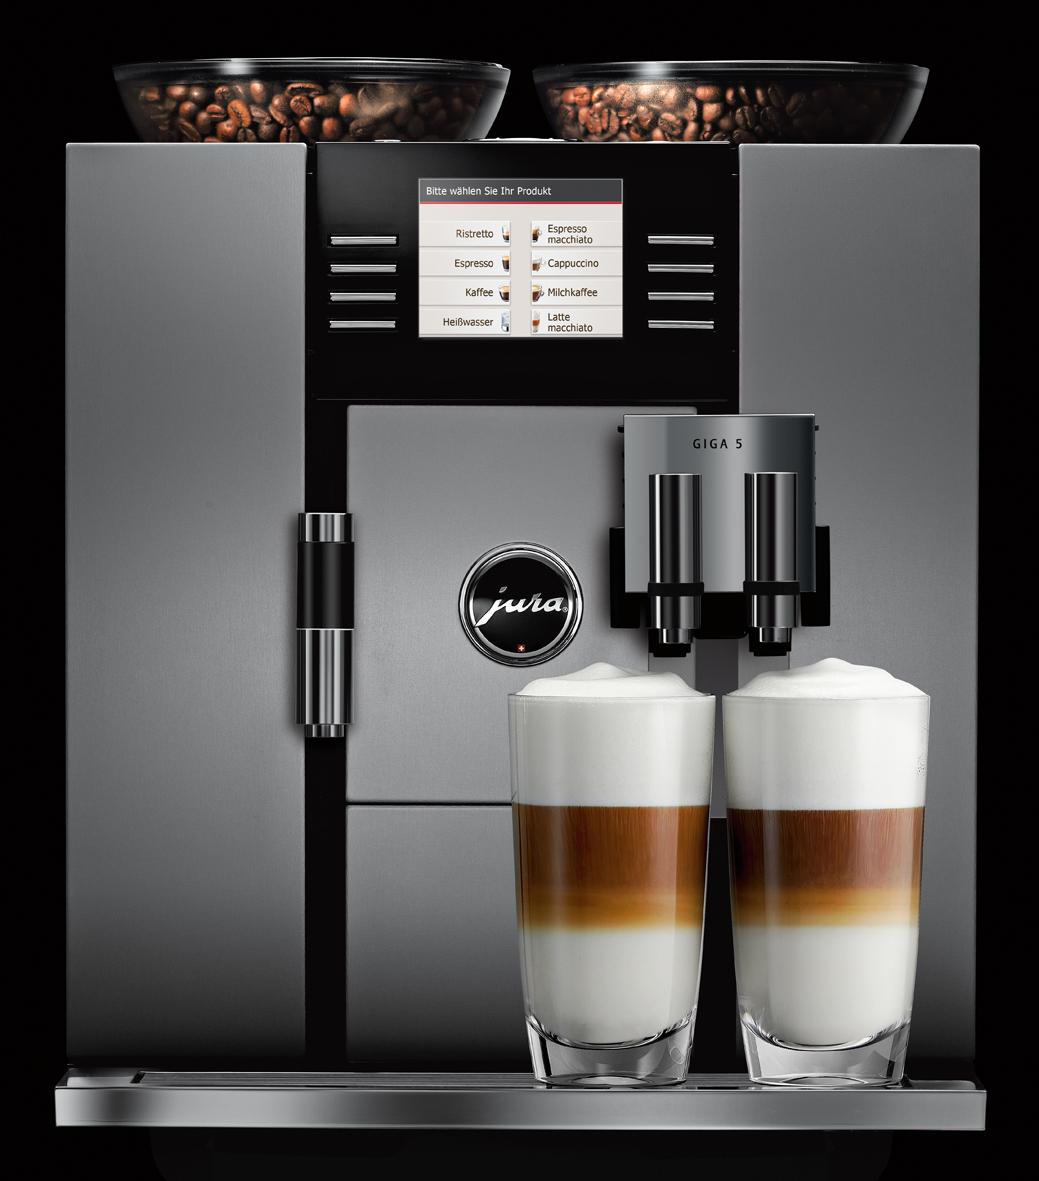 jura giga 5 kaffeevollautomat die super premium klasse. Black Bedroom Furniture Sets. Home Design Ideas